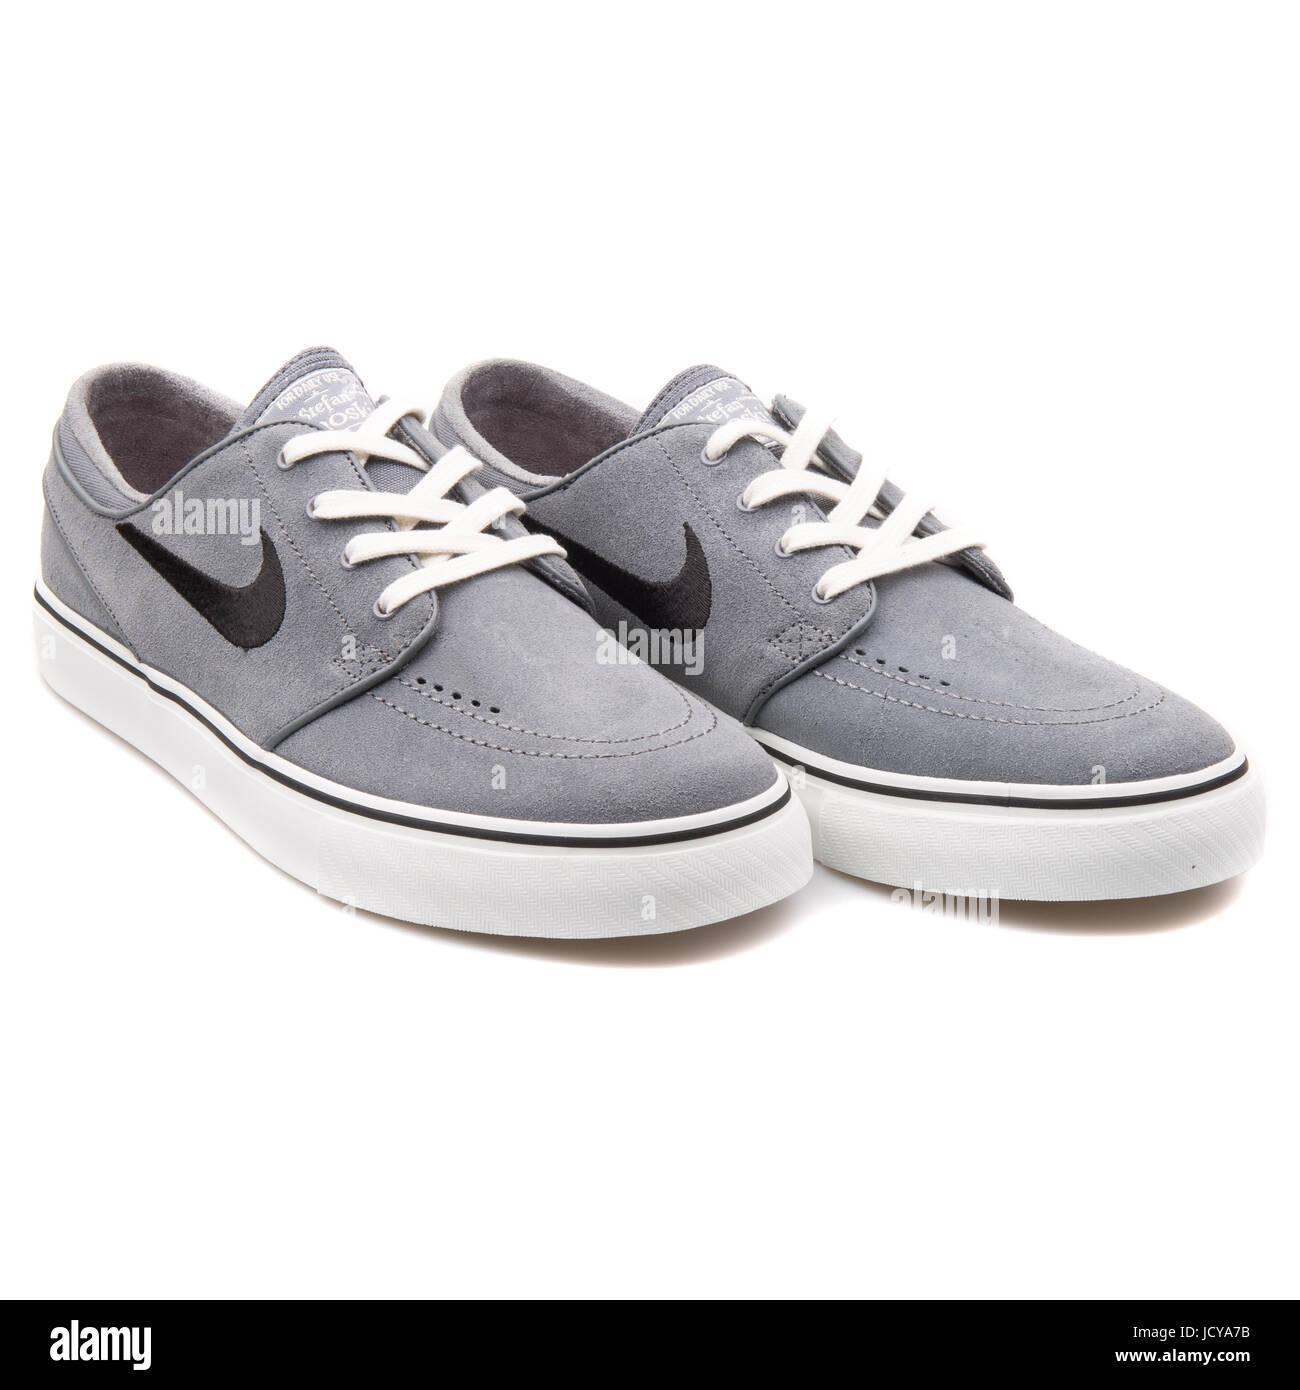 meet 8c178 d5370 Nike Zoom Stefan Janoski Cool Grey and White Men s Skateboarding Shoes -  333824-045 -